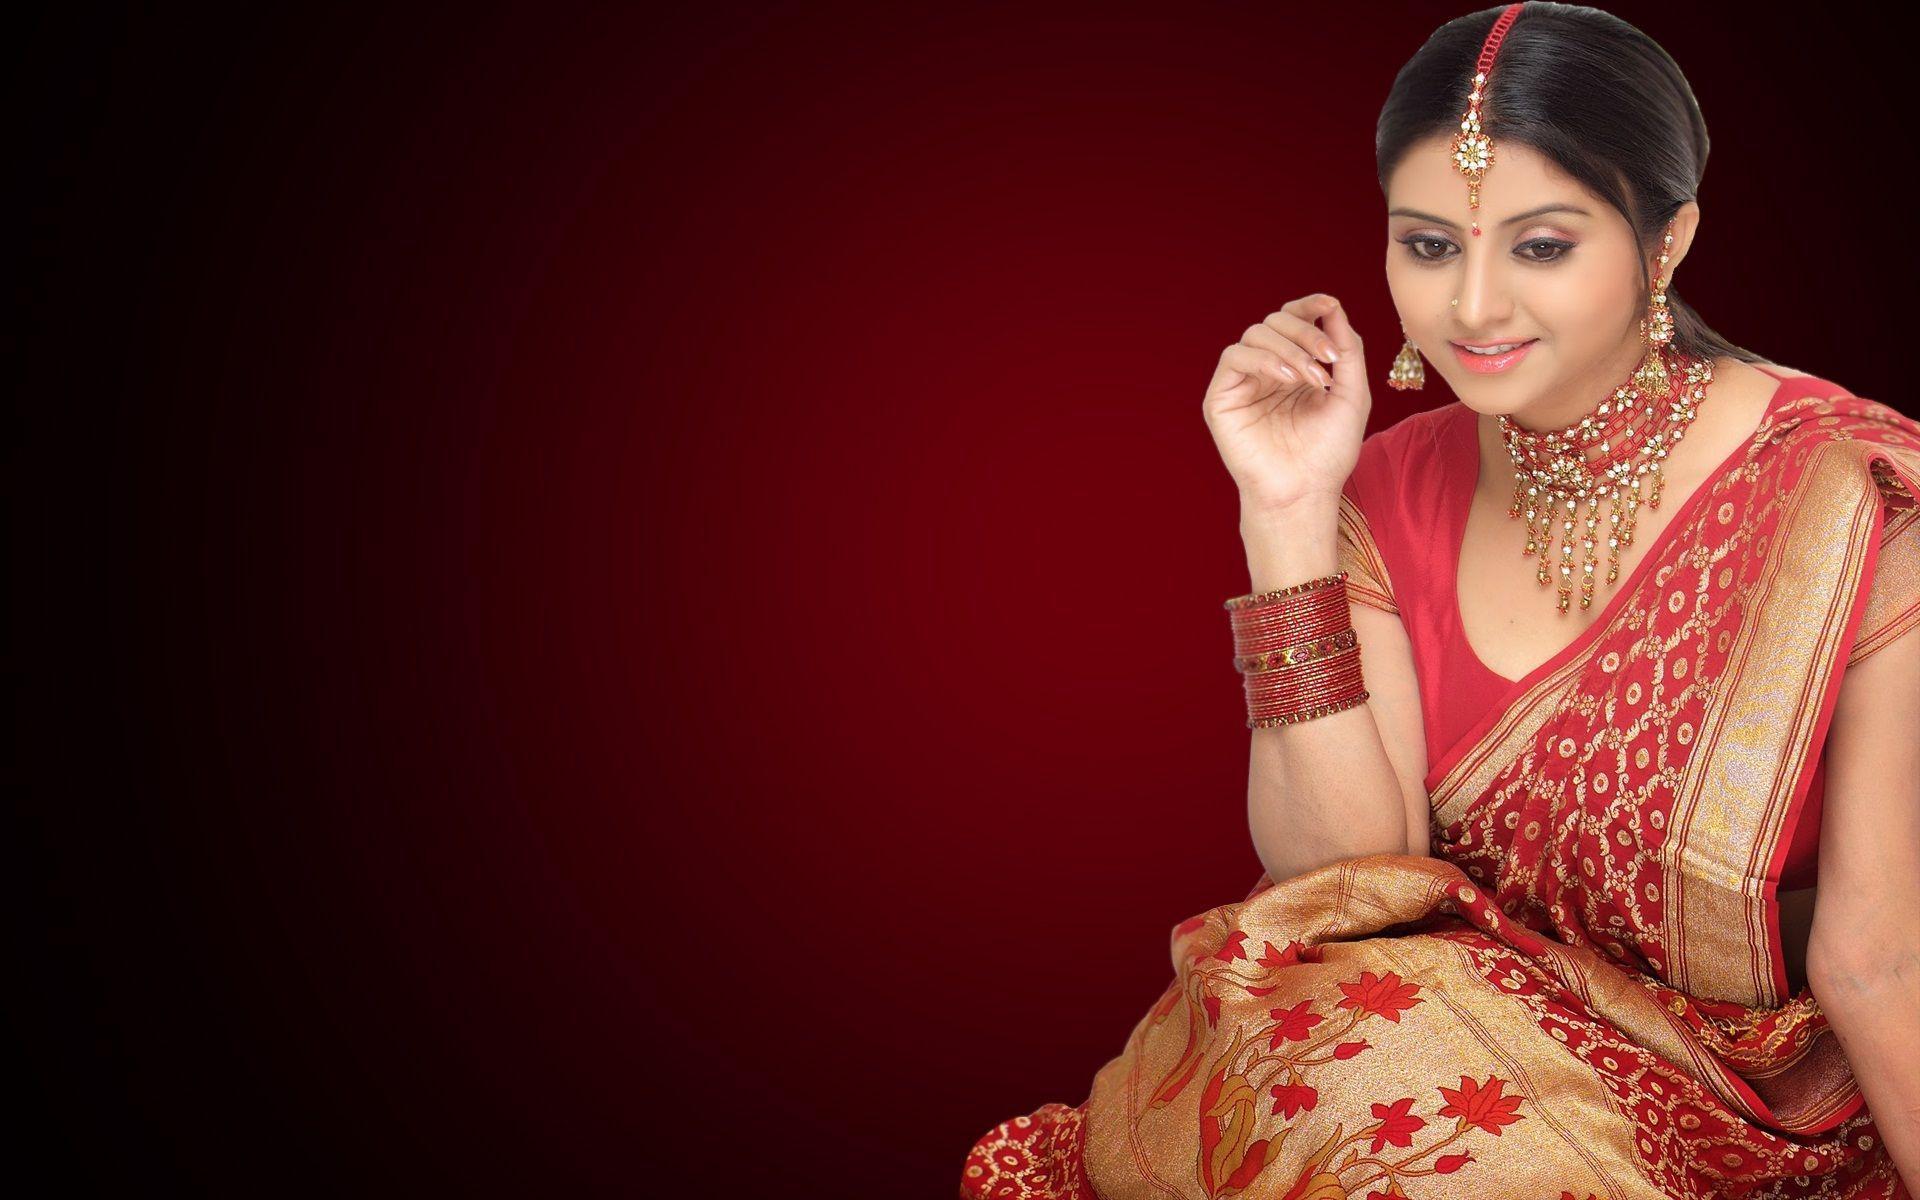 Indian Woman Dulhan Look Wallpaper